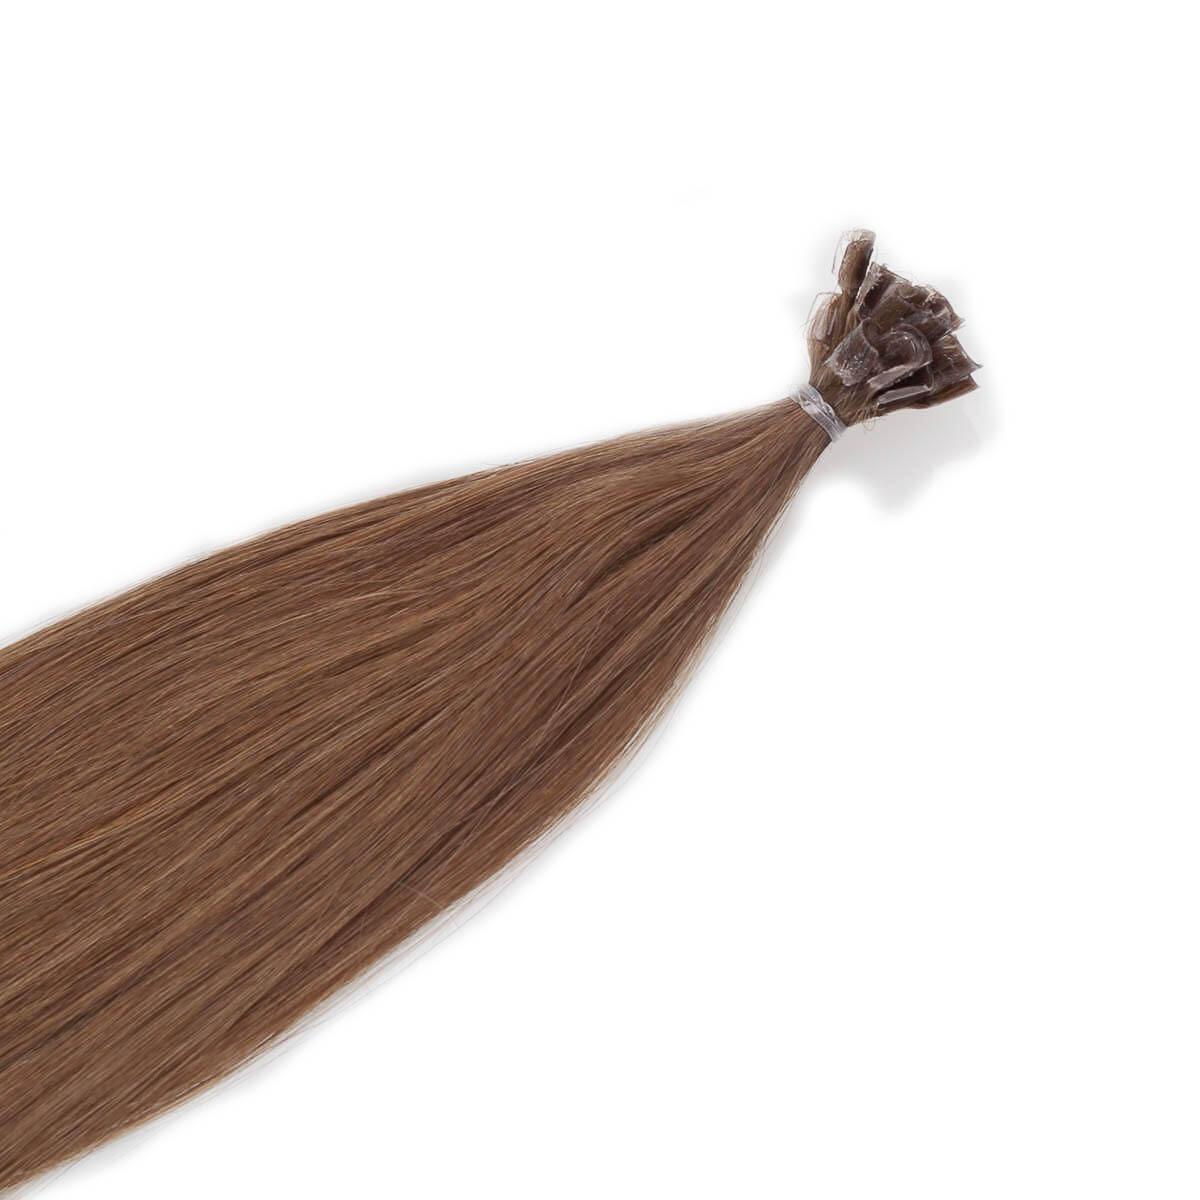 Nail Hair Original 5.1 Medium Ash Brown 40 cm